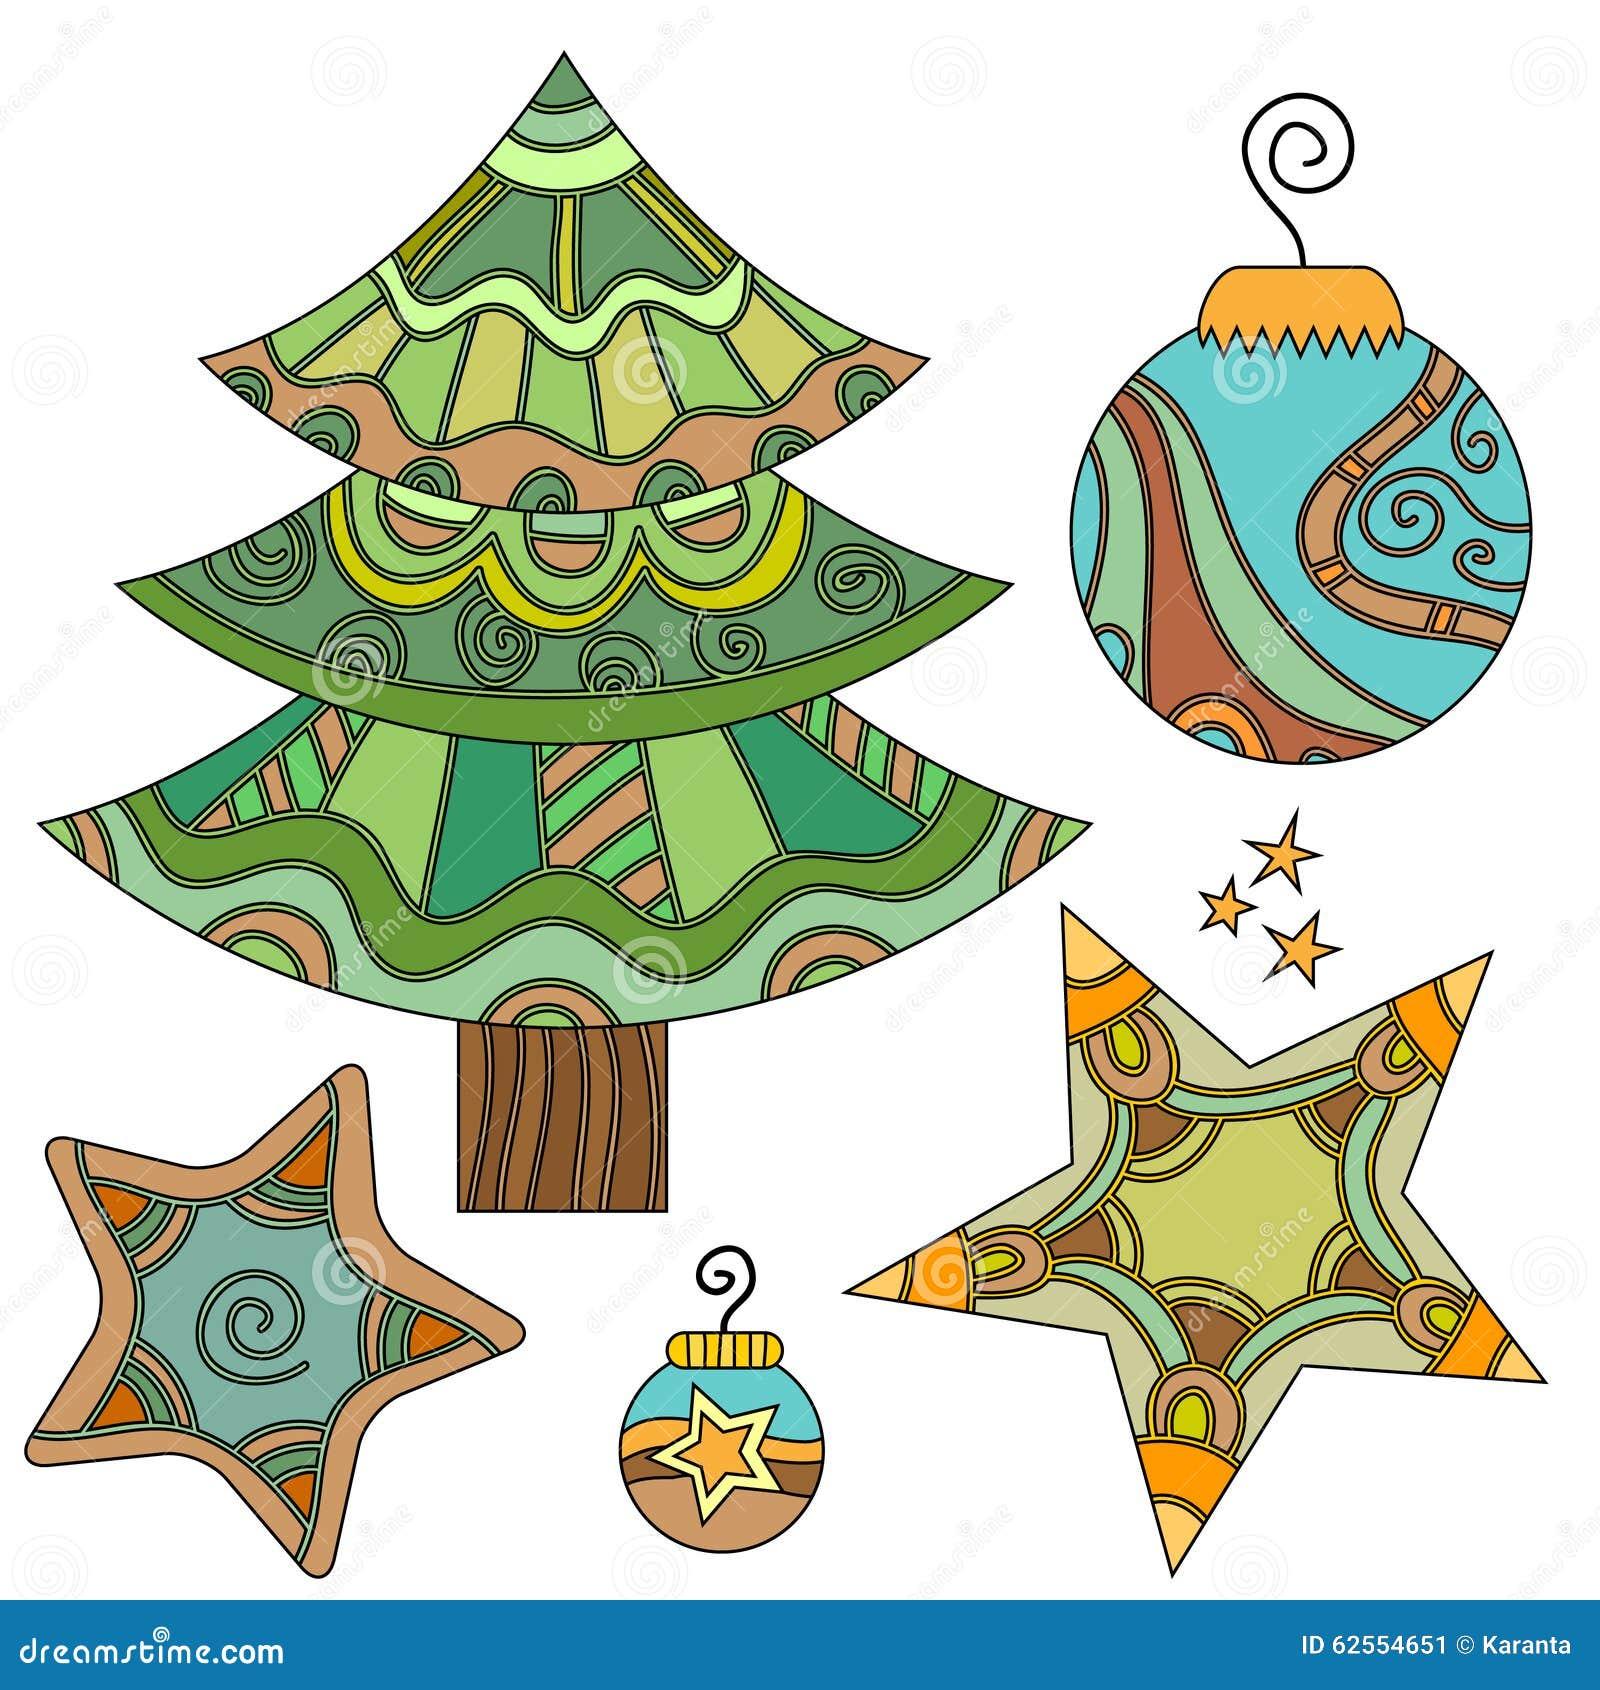 whimsical christmas tree clip art free - photo #14